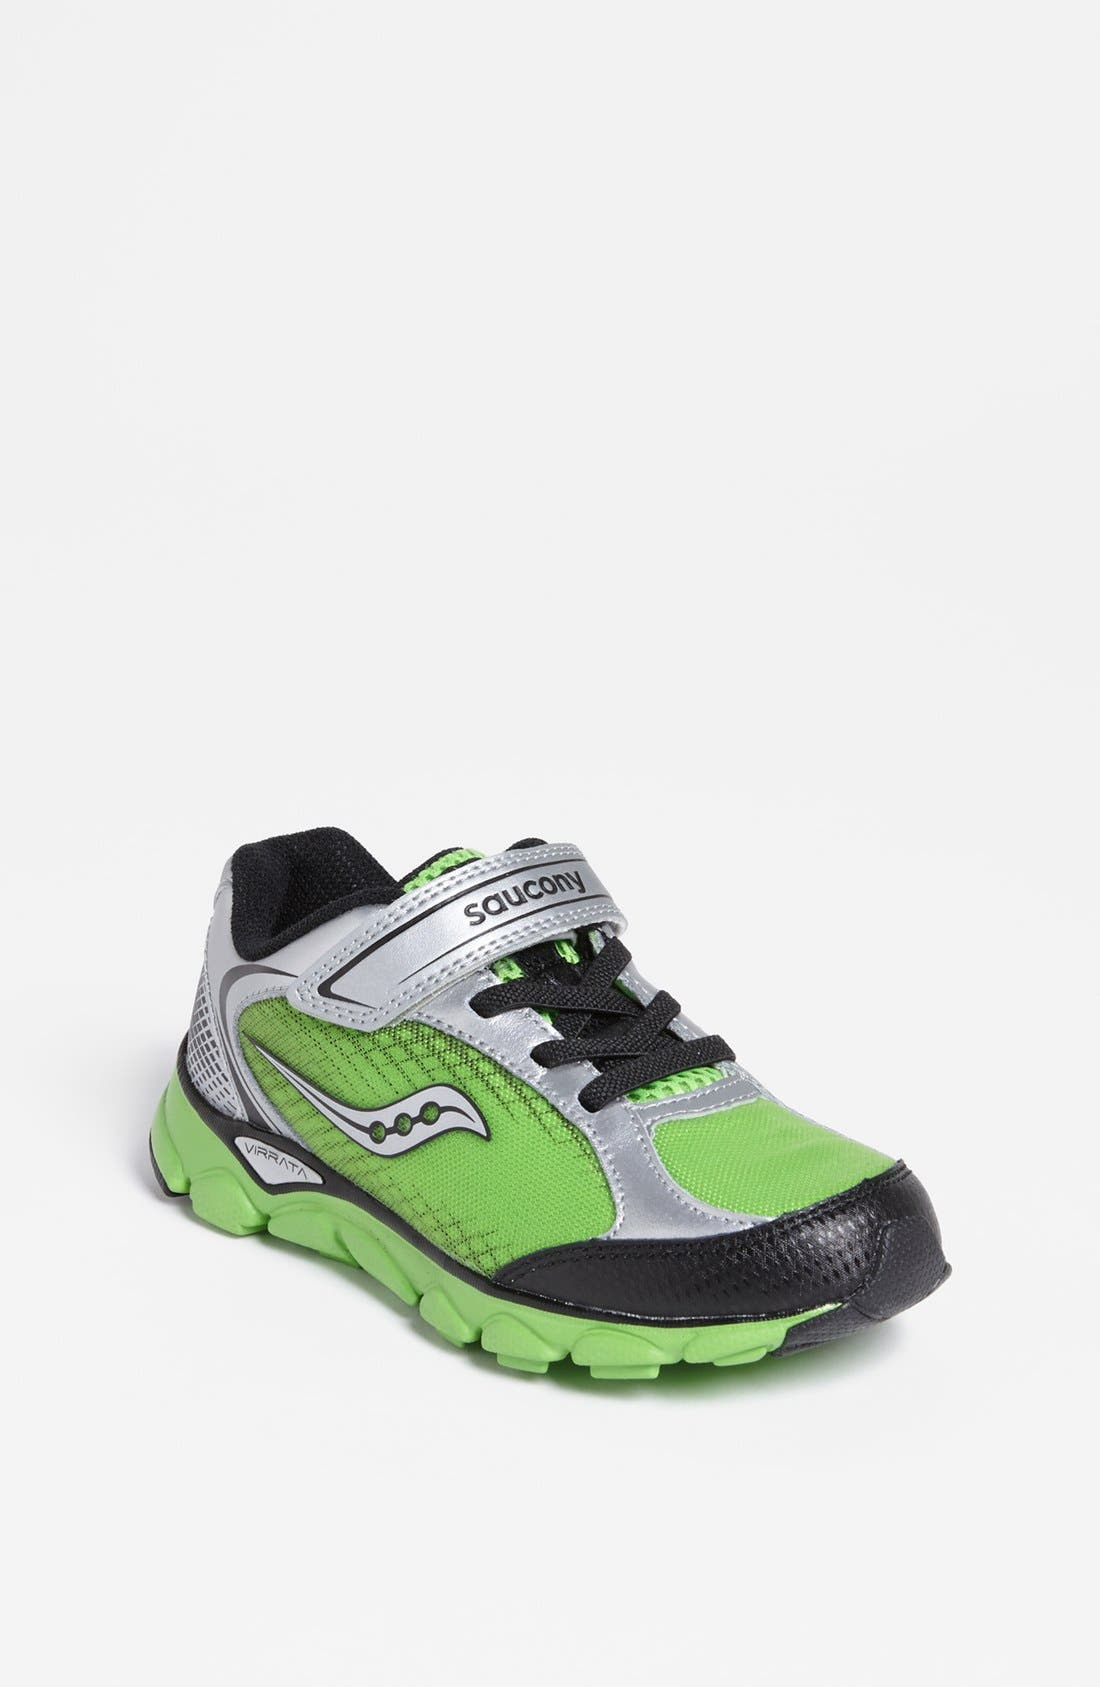 Alternate Image 1 Selected - Saucony 'Virrata' Sneaker (Toddler & Little Kid)